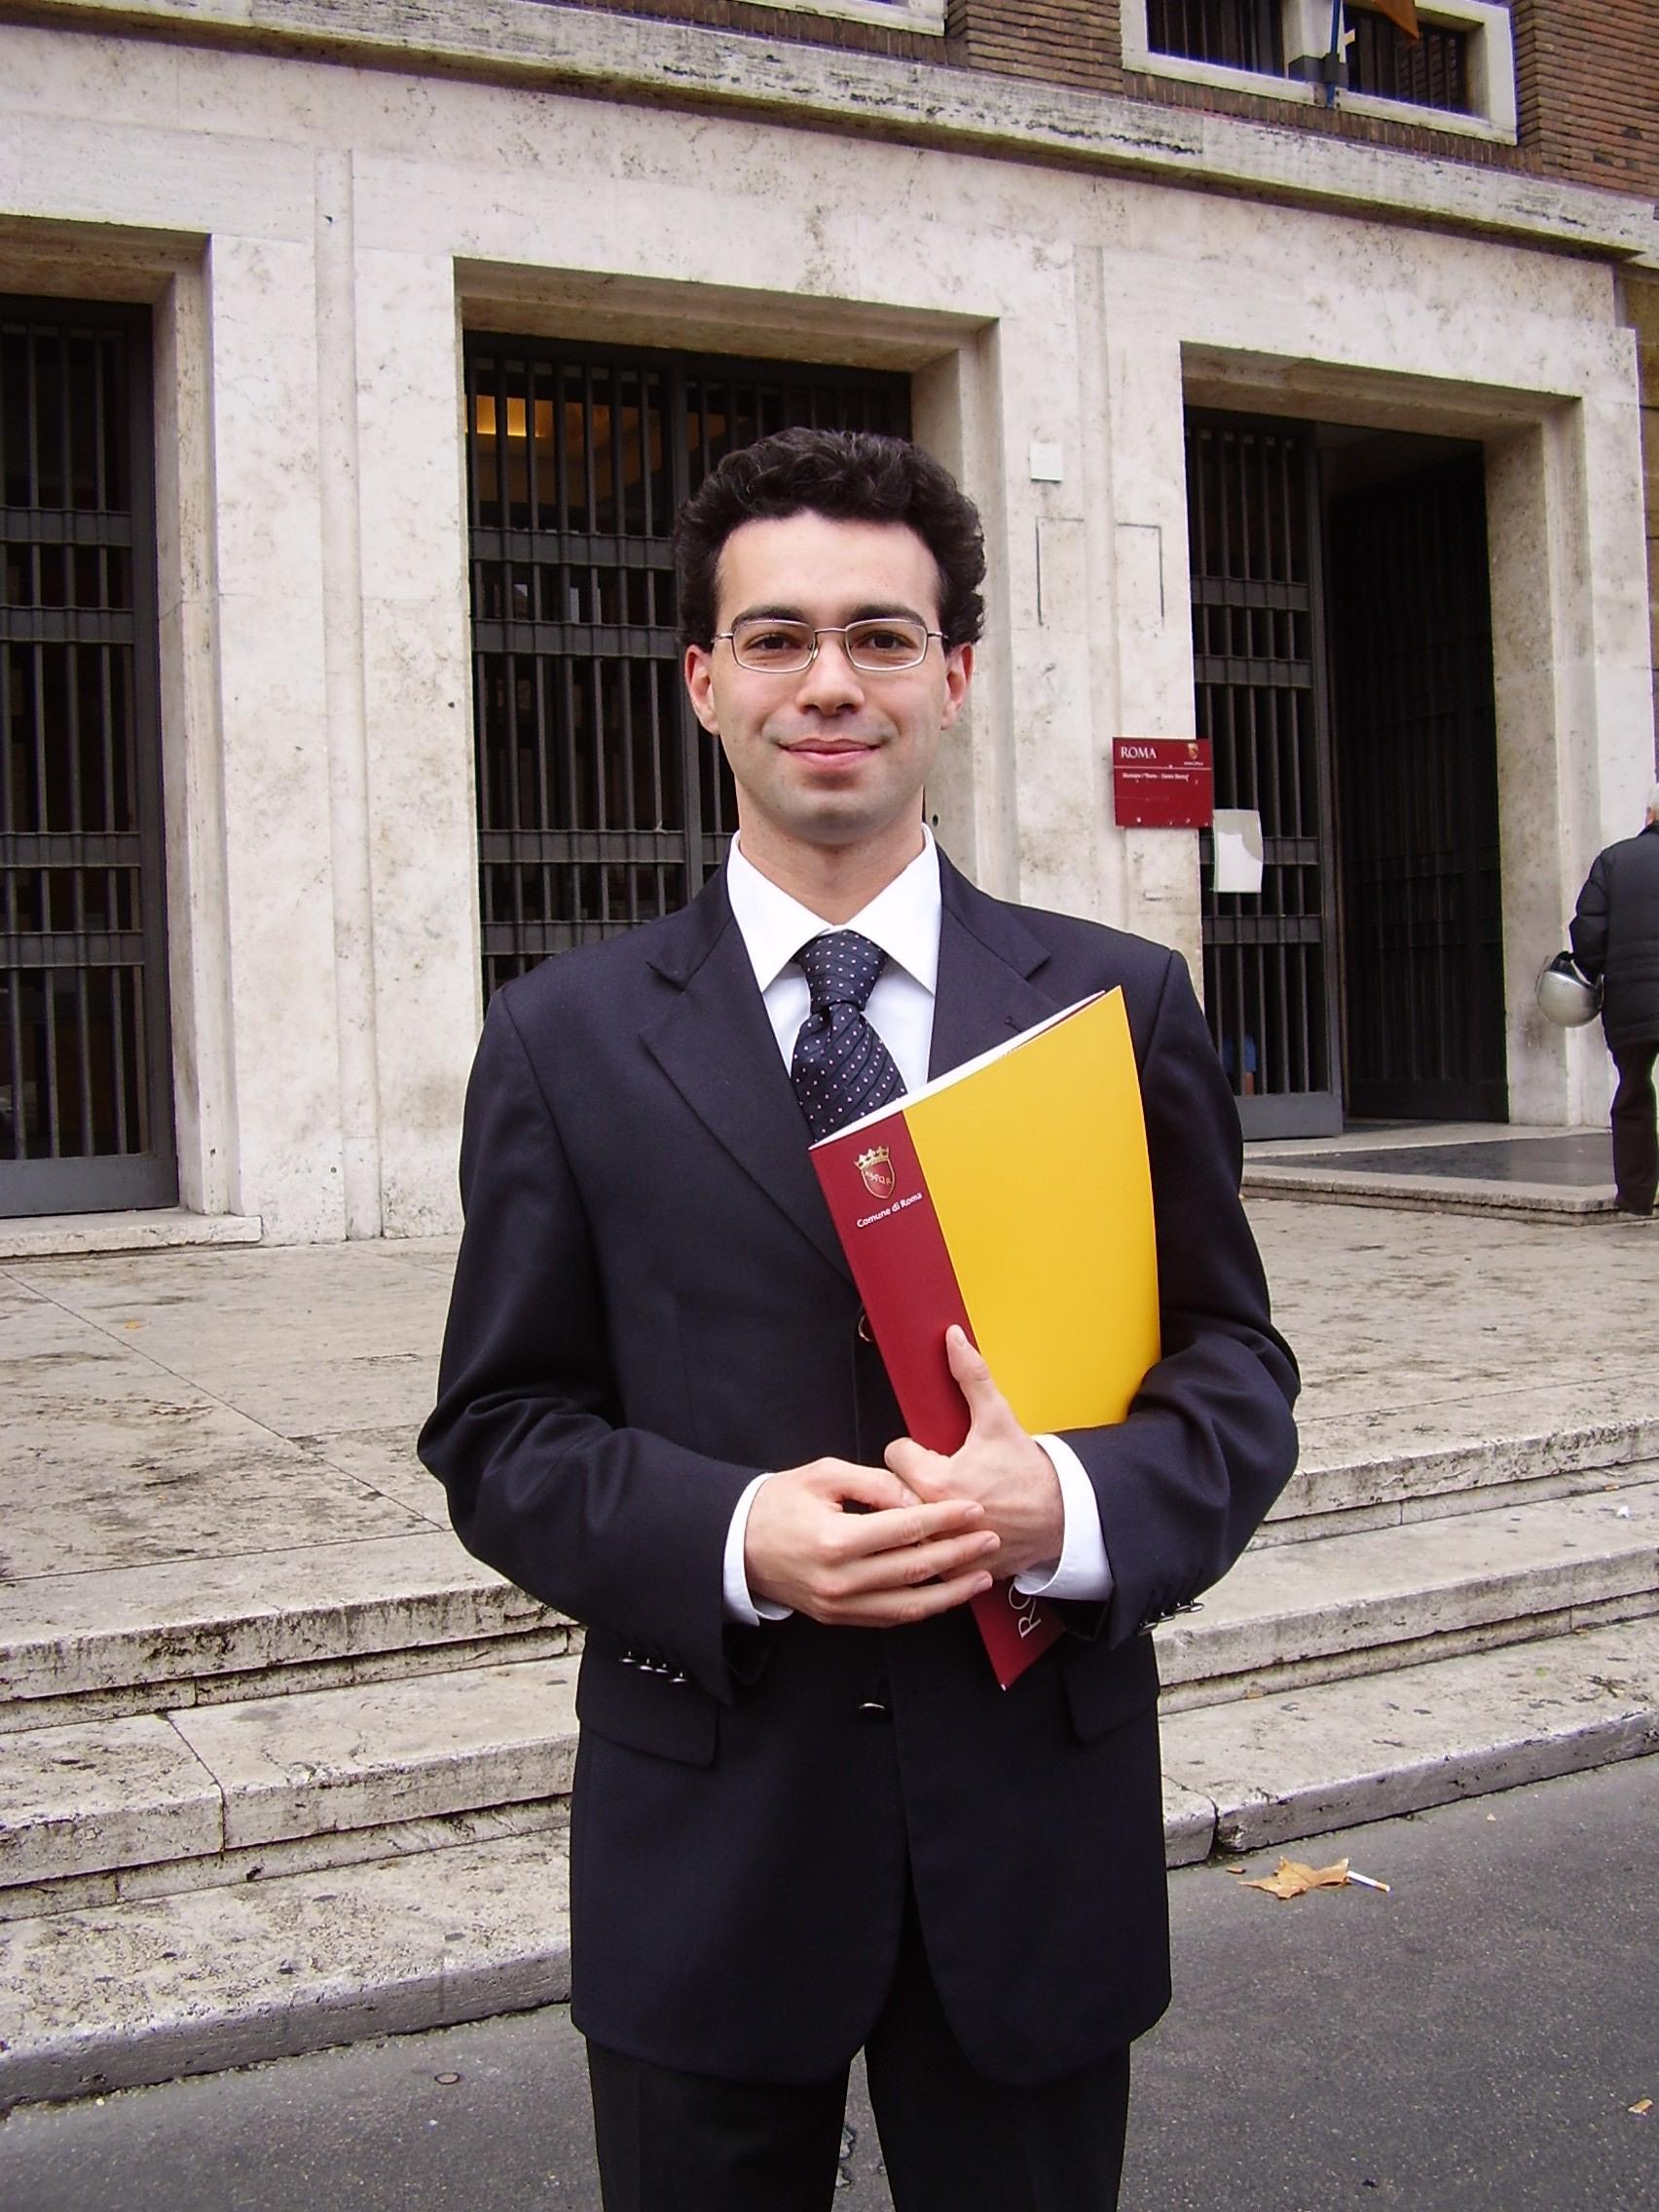 Guide privé à Rome